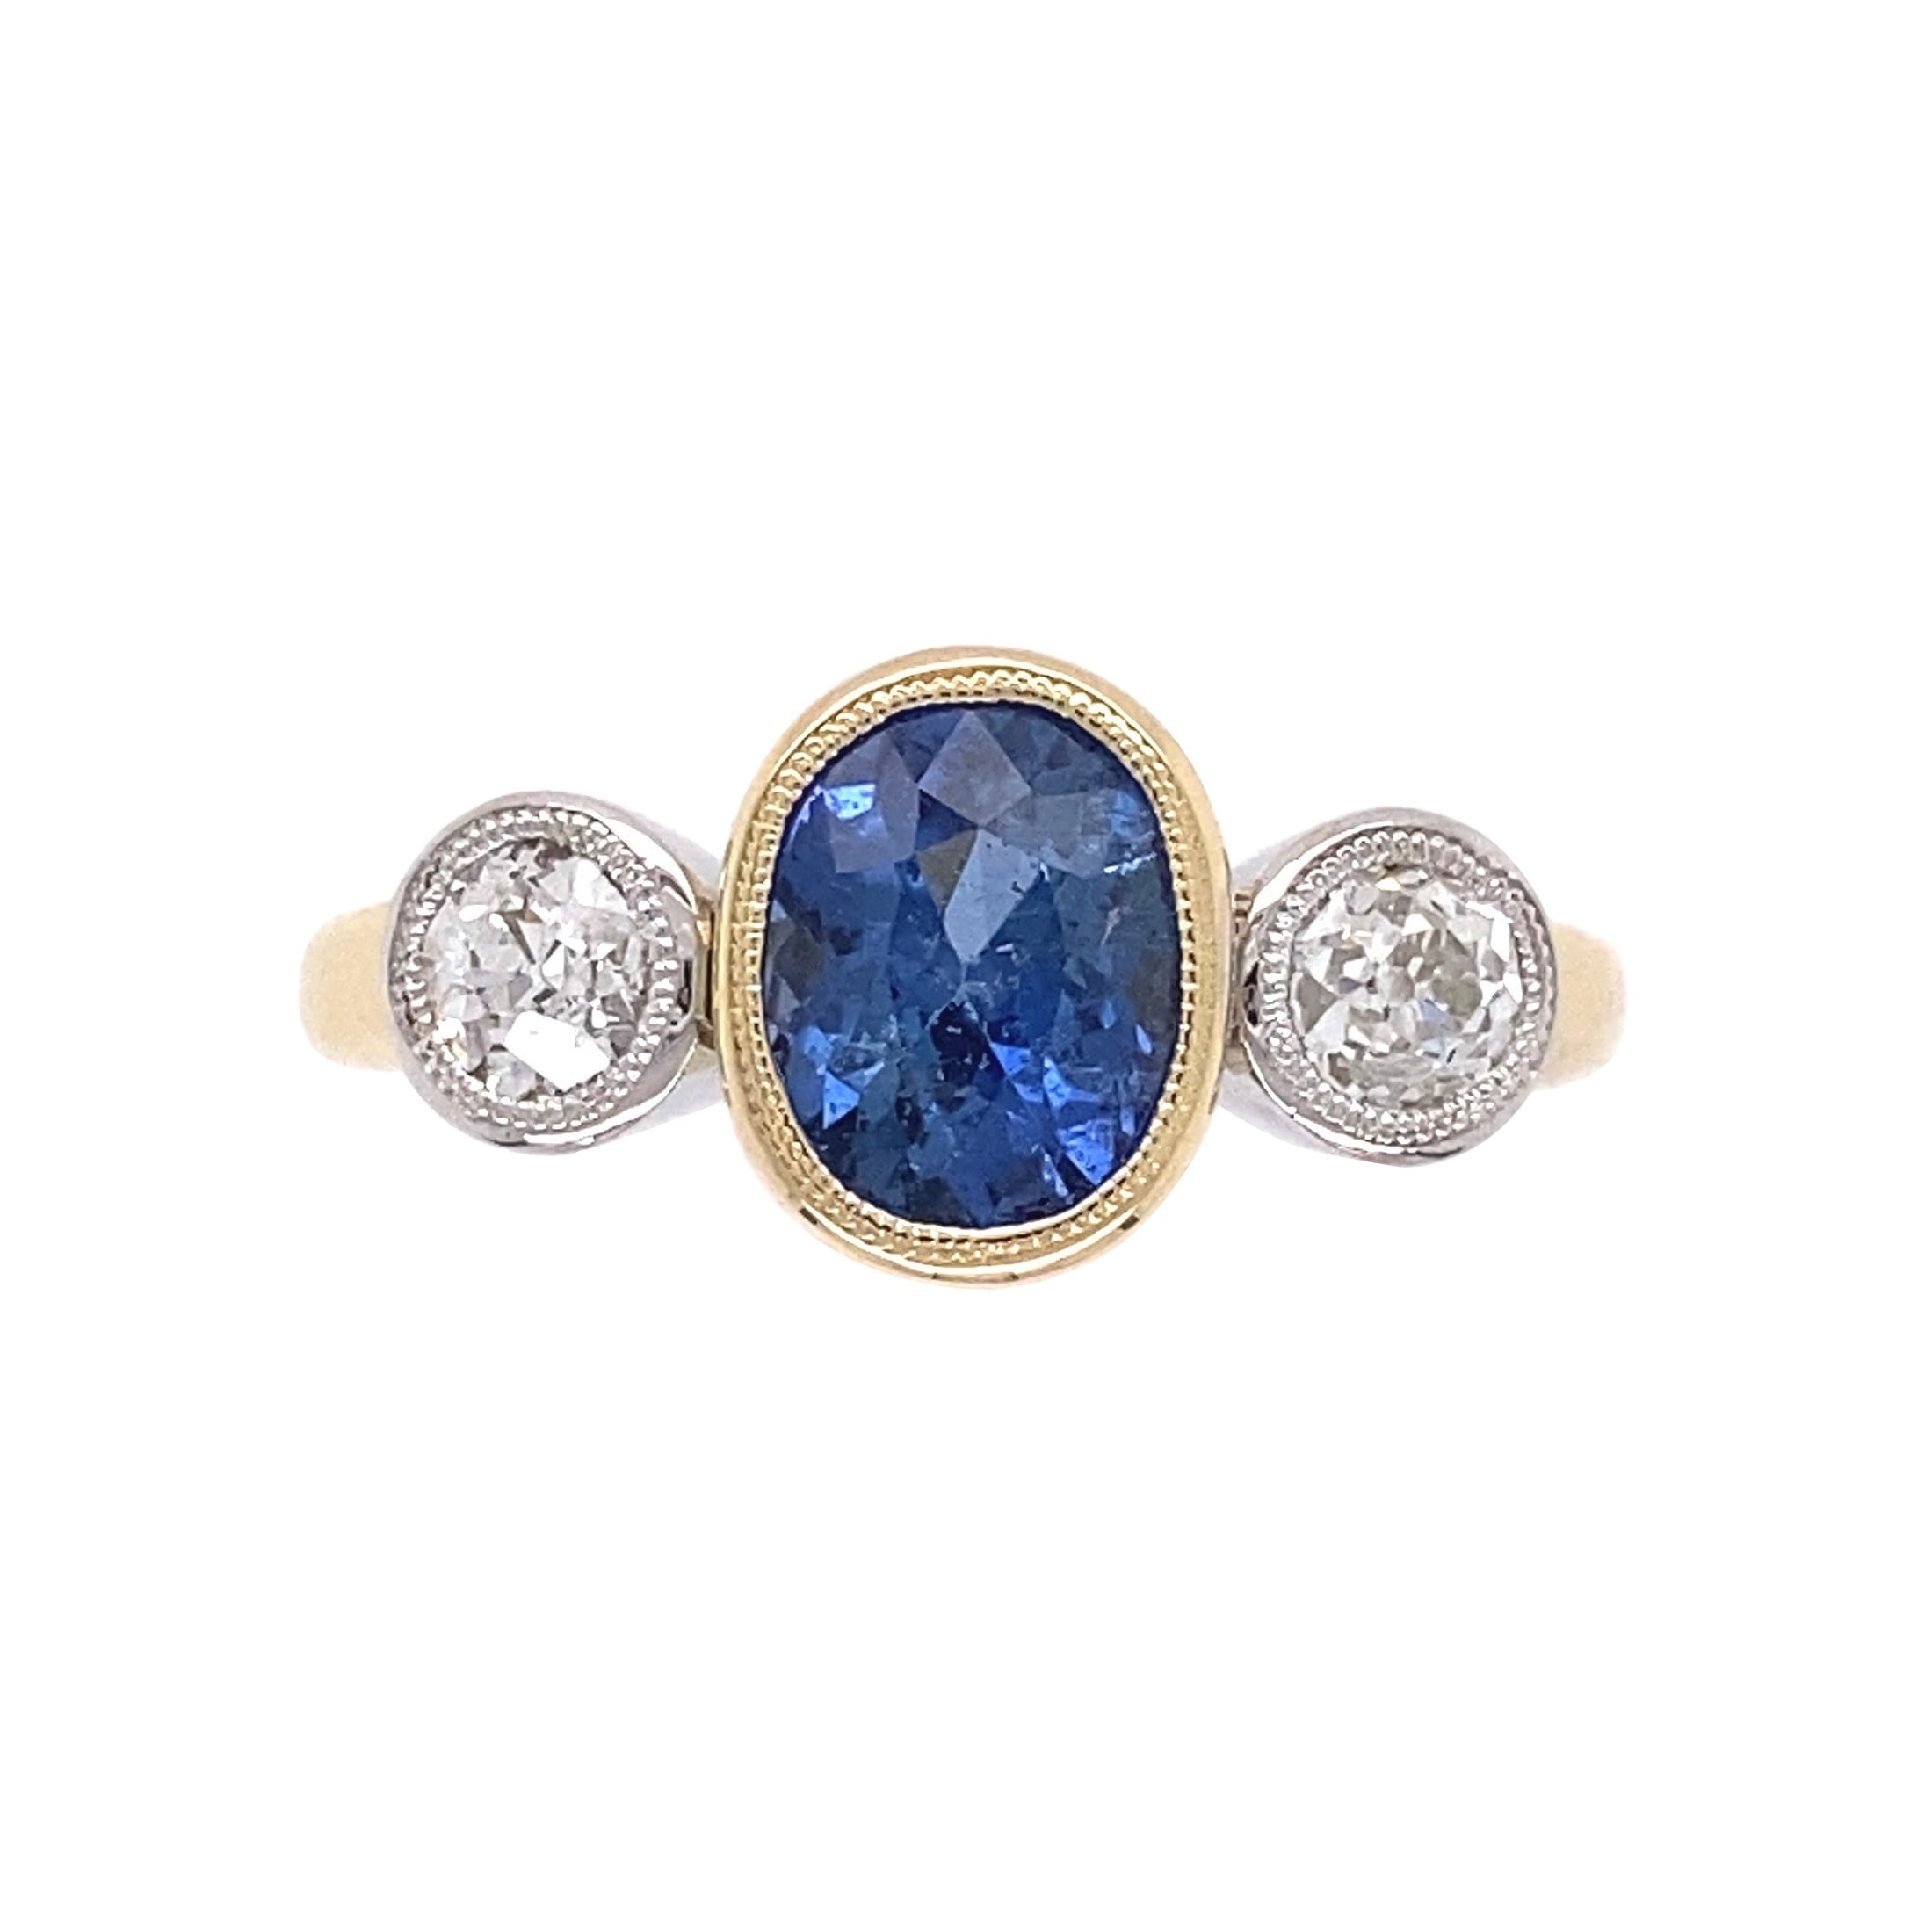 1.68 Carat Blue Sapphire and Diamond Gold Ring Estate Fine Jewelry